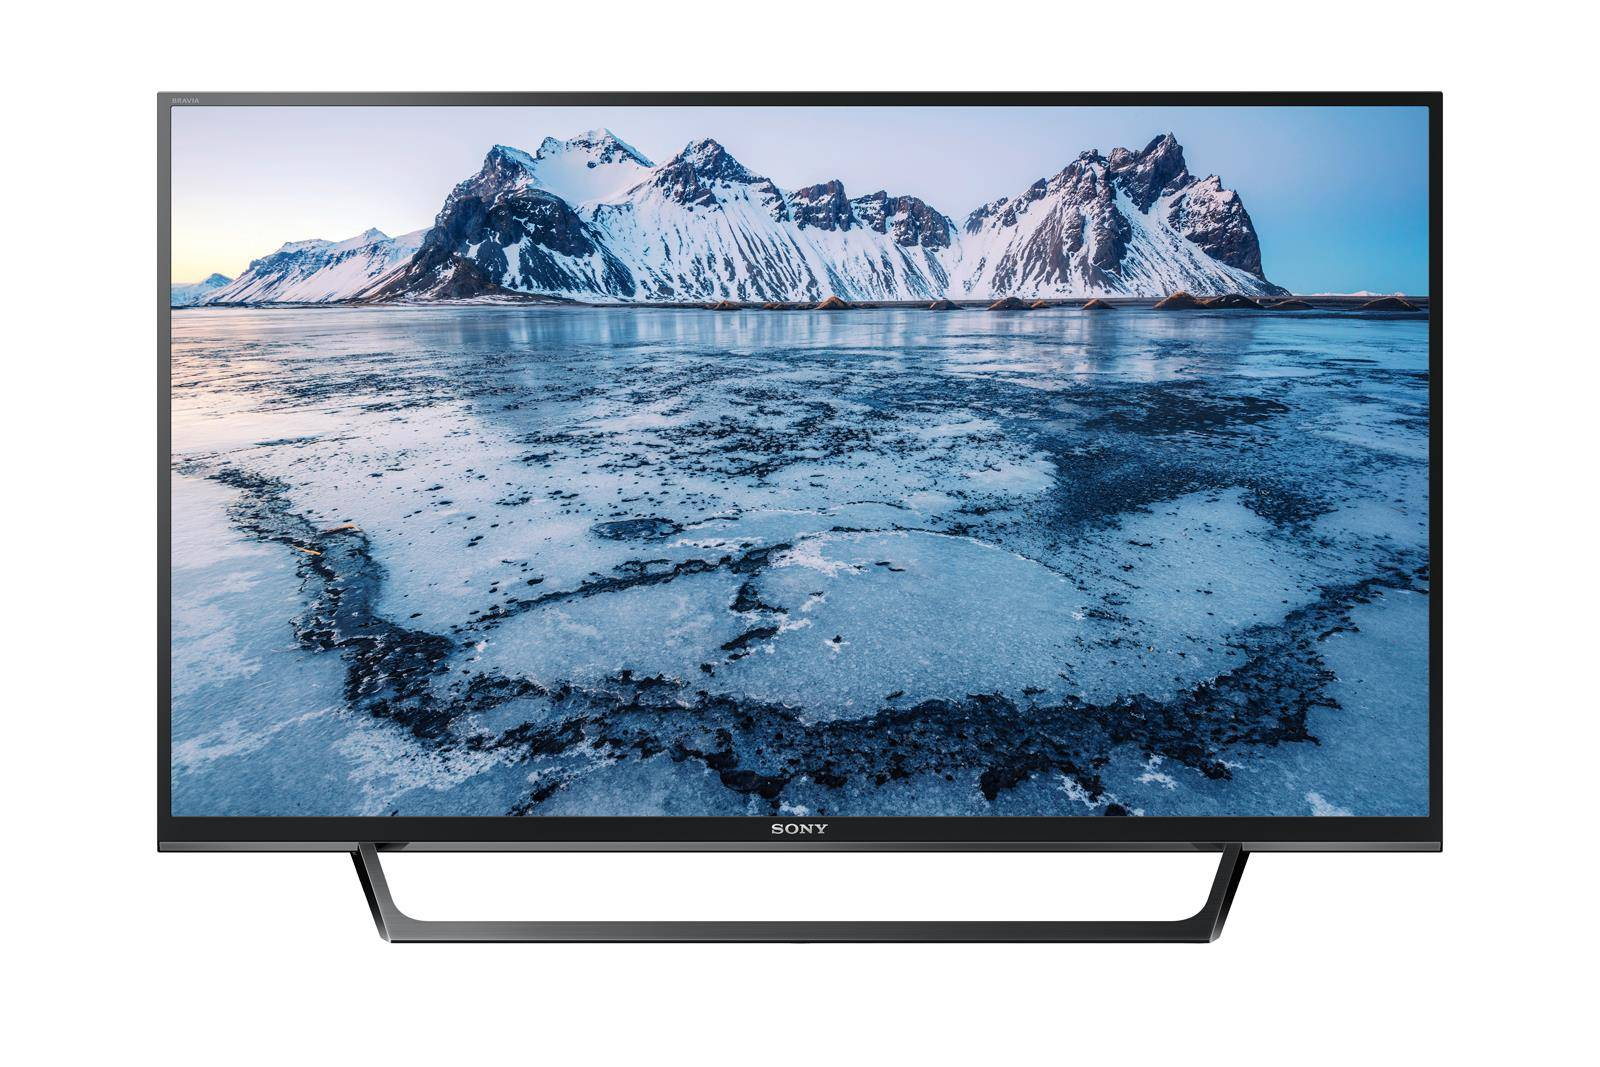 Sony KDL40WE665 Tv Led 40'' Edge Full HD Smart Tv con browser 200hz